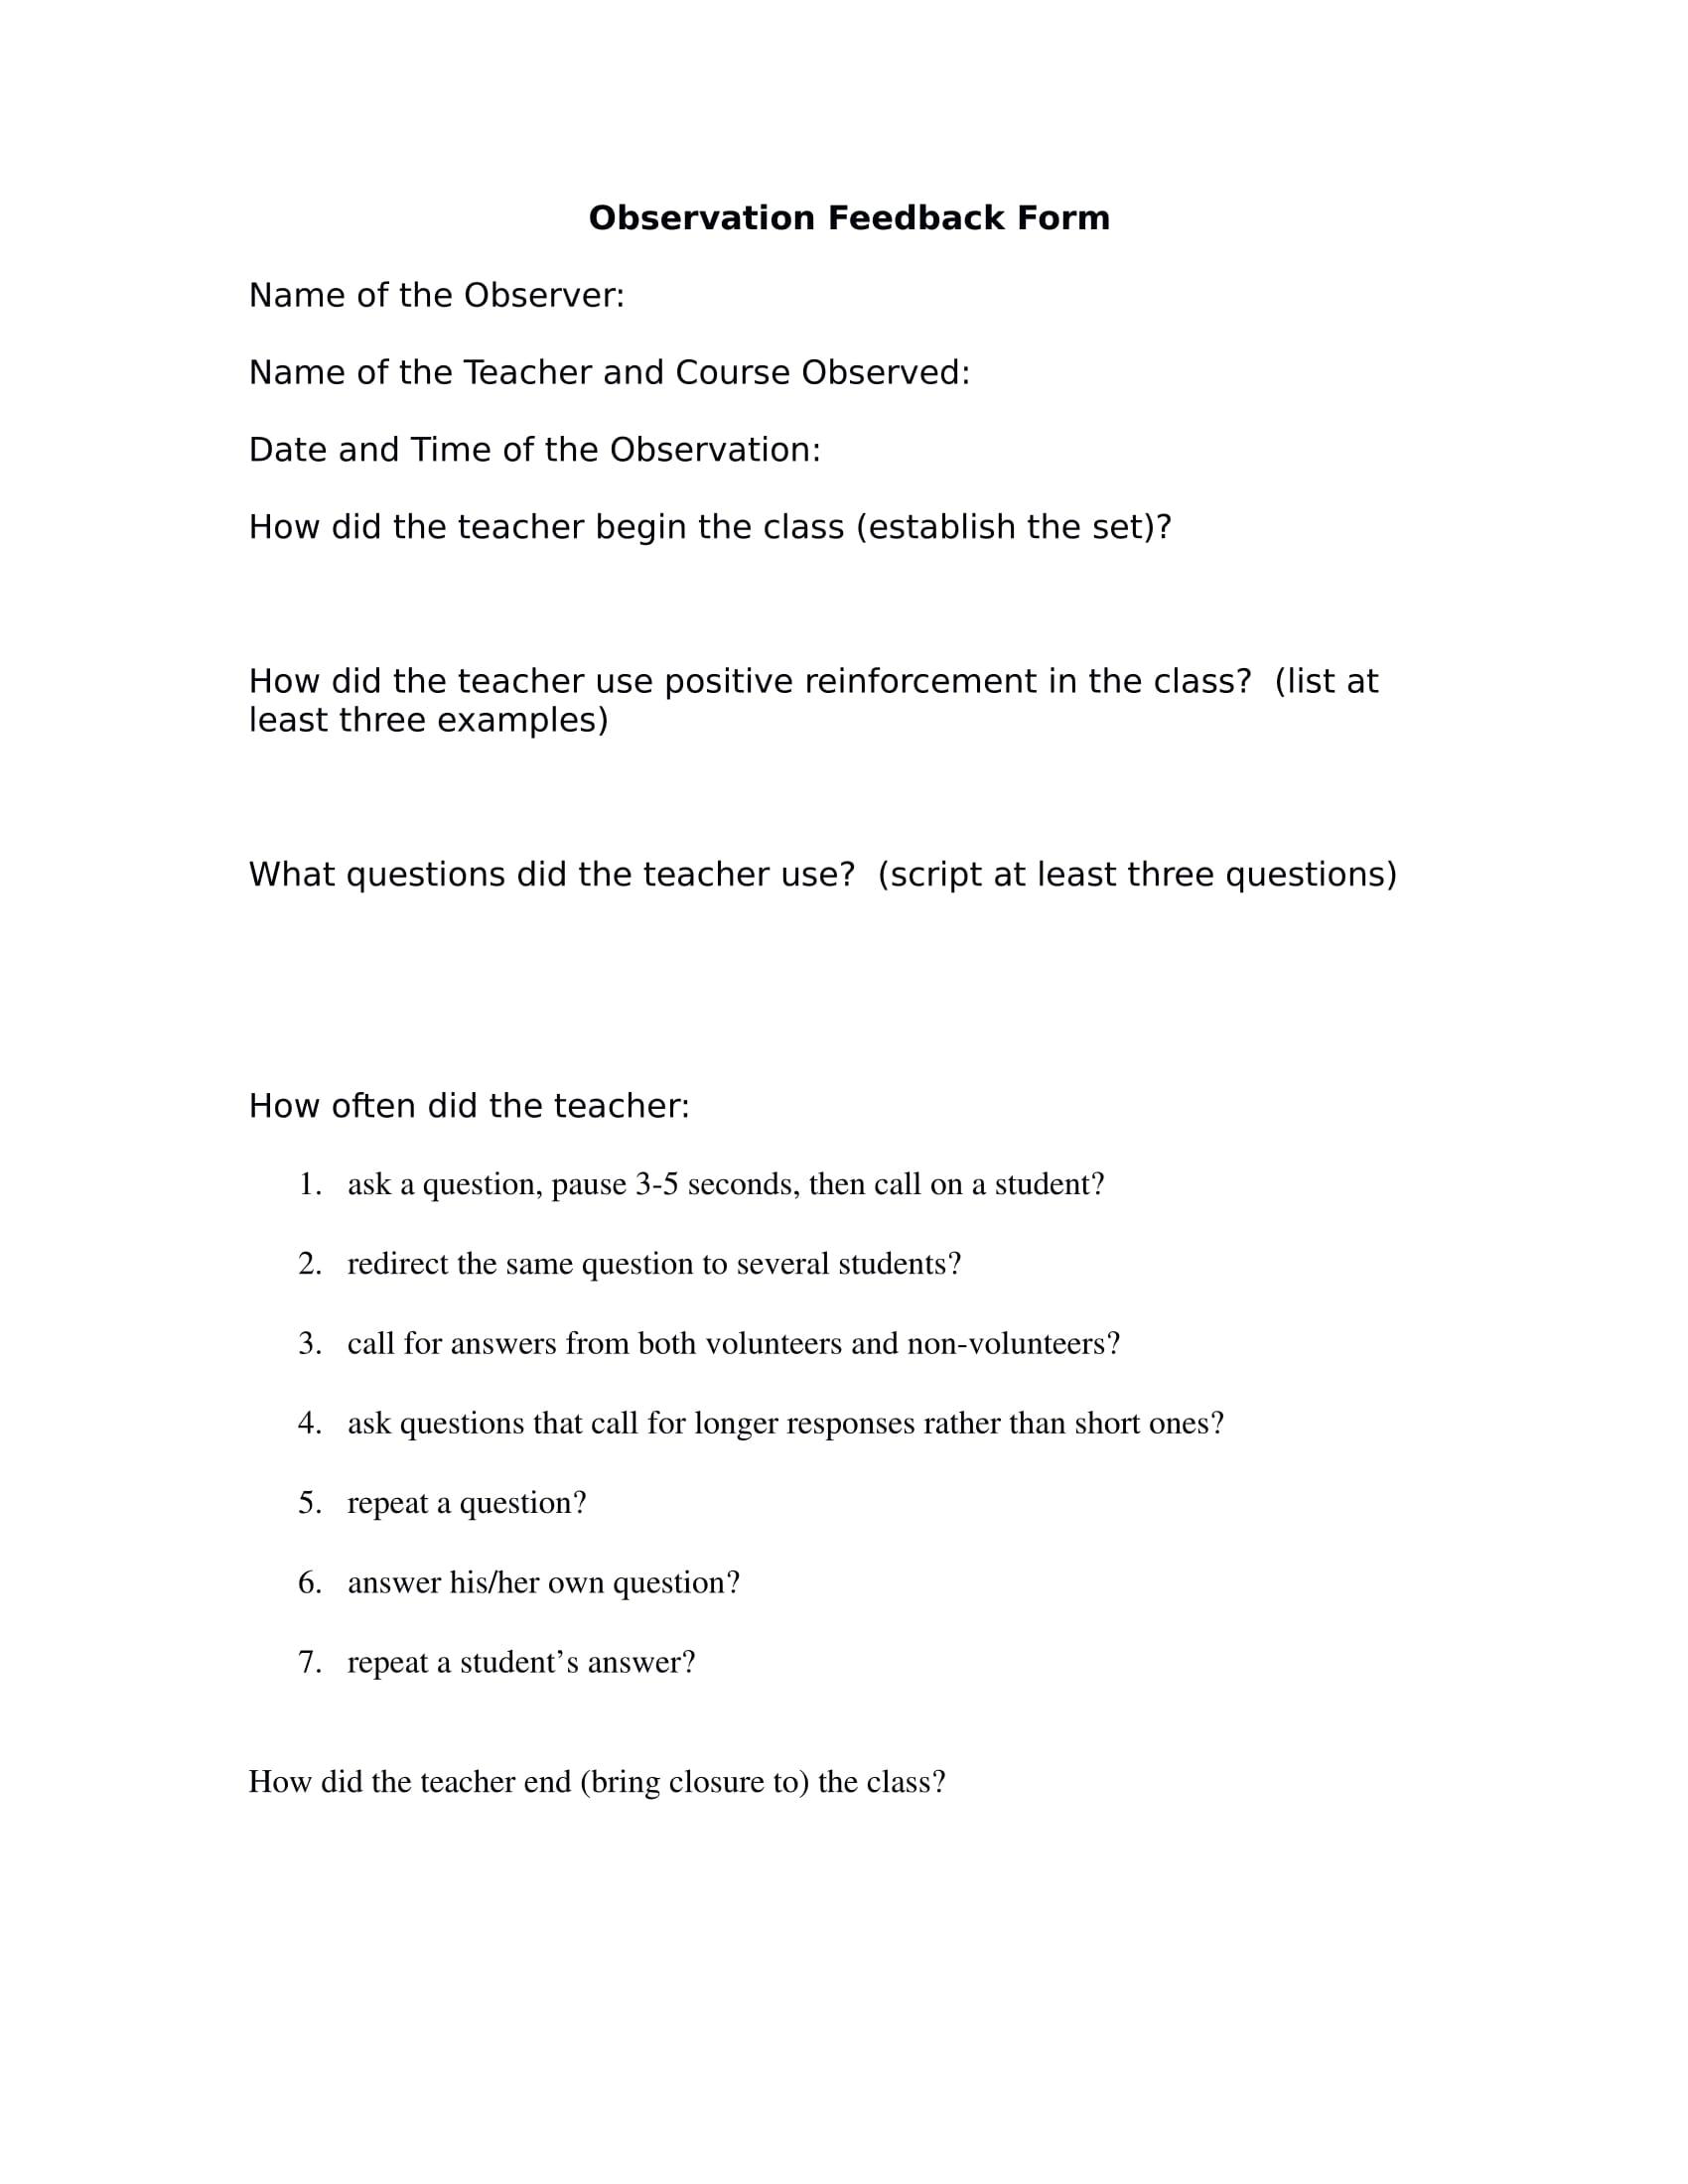 observation feedback form in doc 1